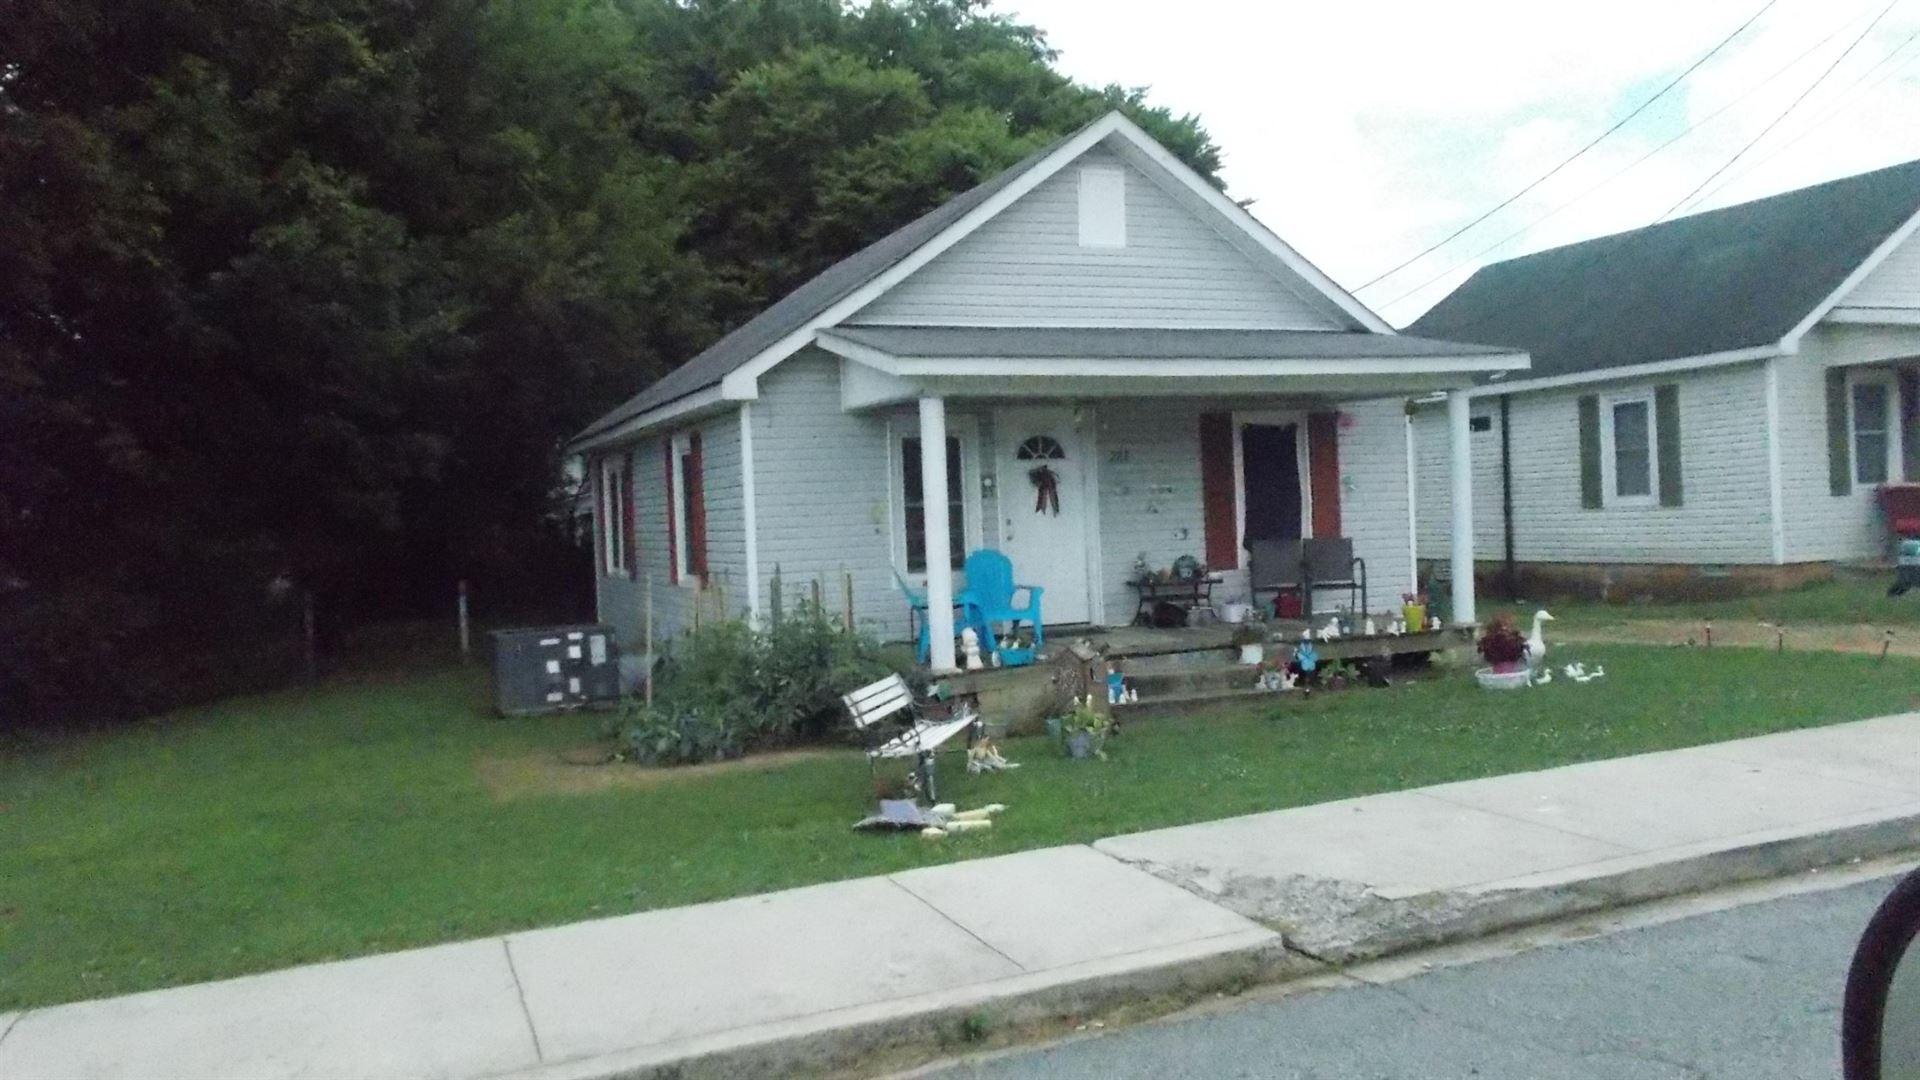 222 E Taylor St, Lawrenceburg, TN 38464 - MLS#: 2268692